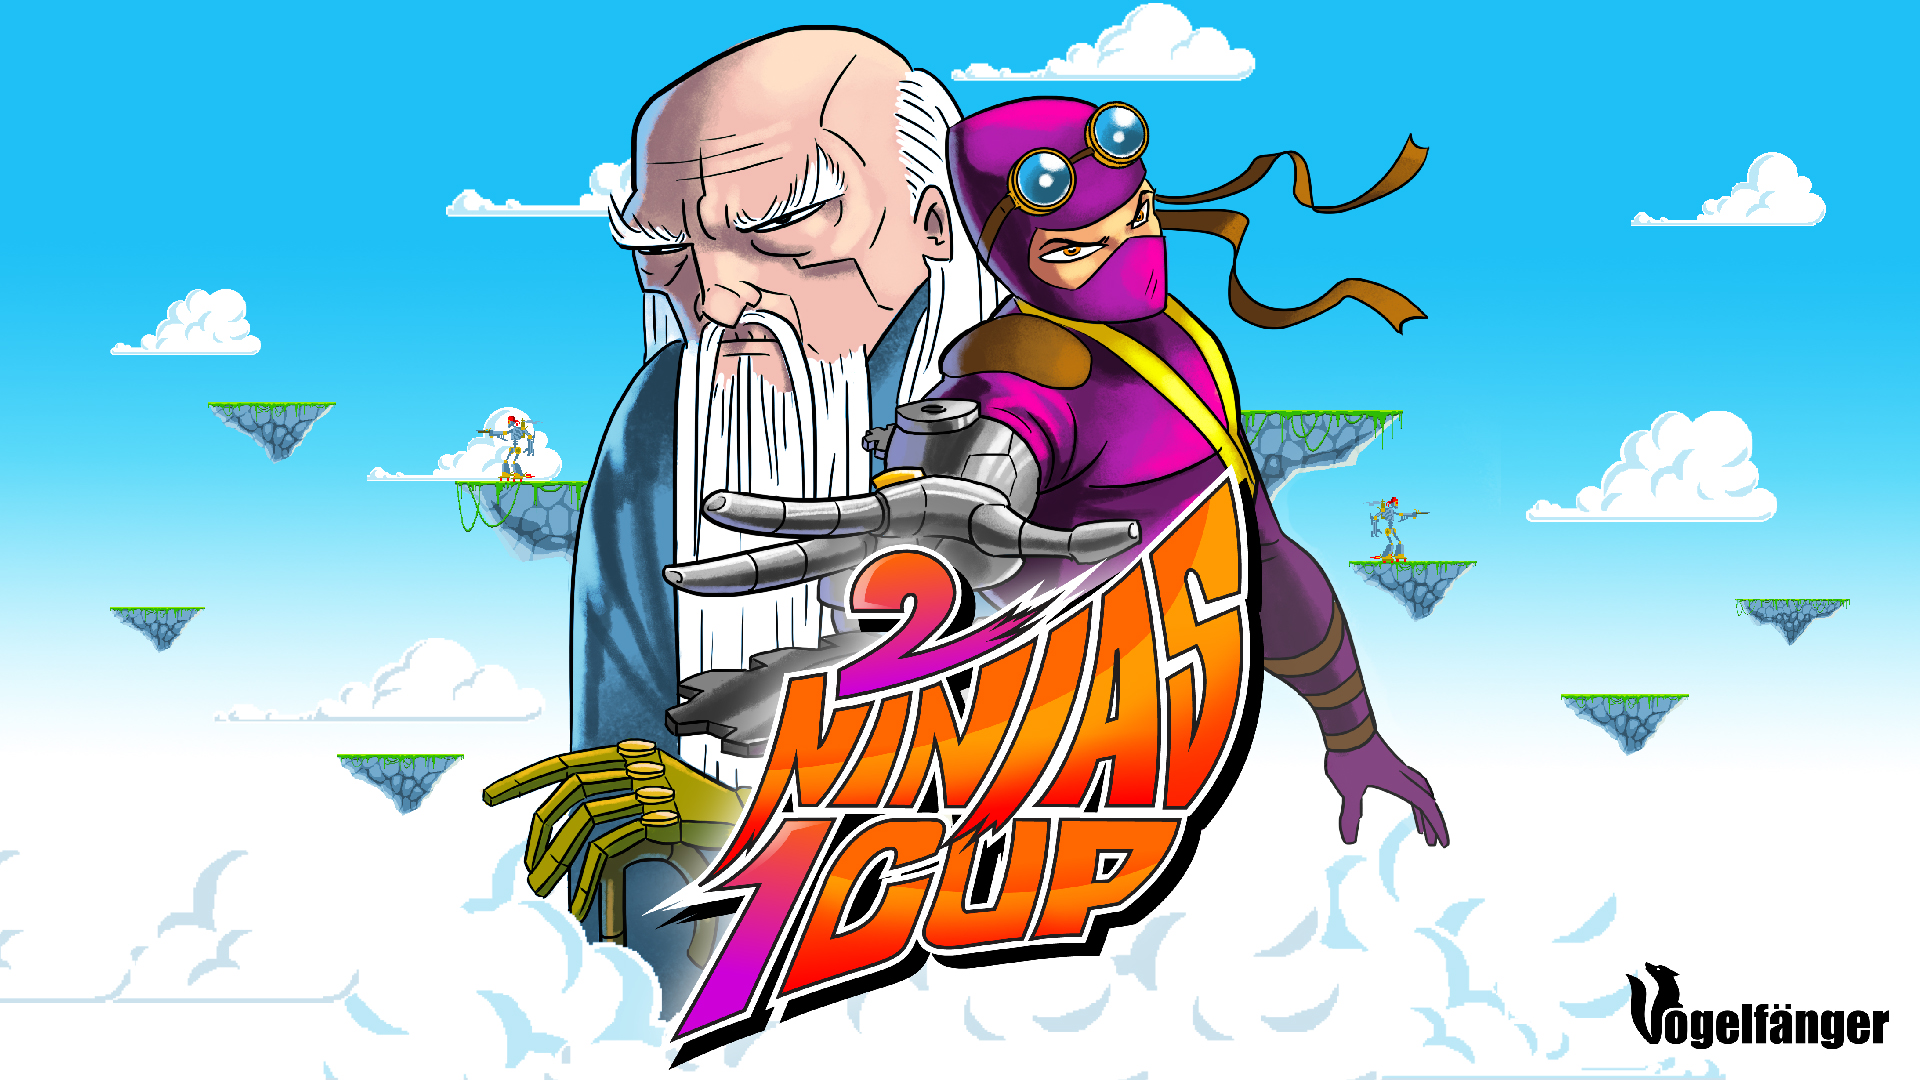 2 Ninjas 1 Cup